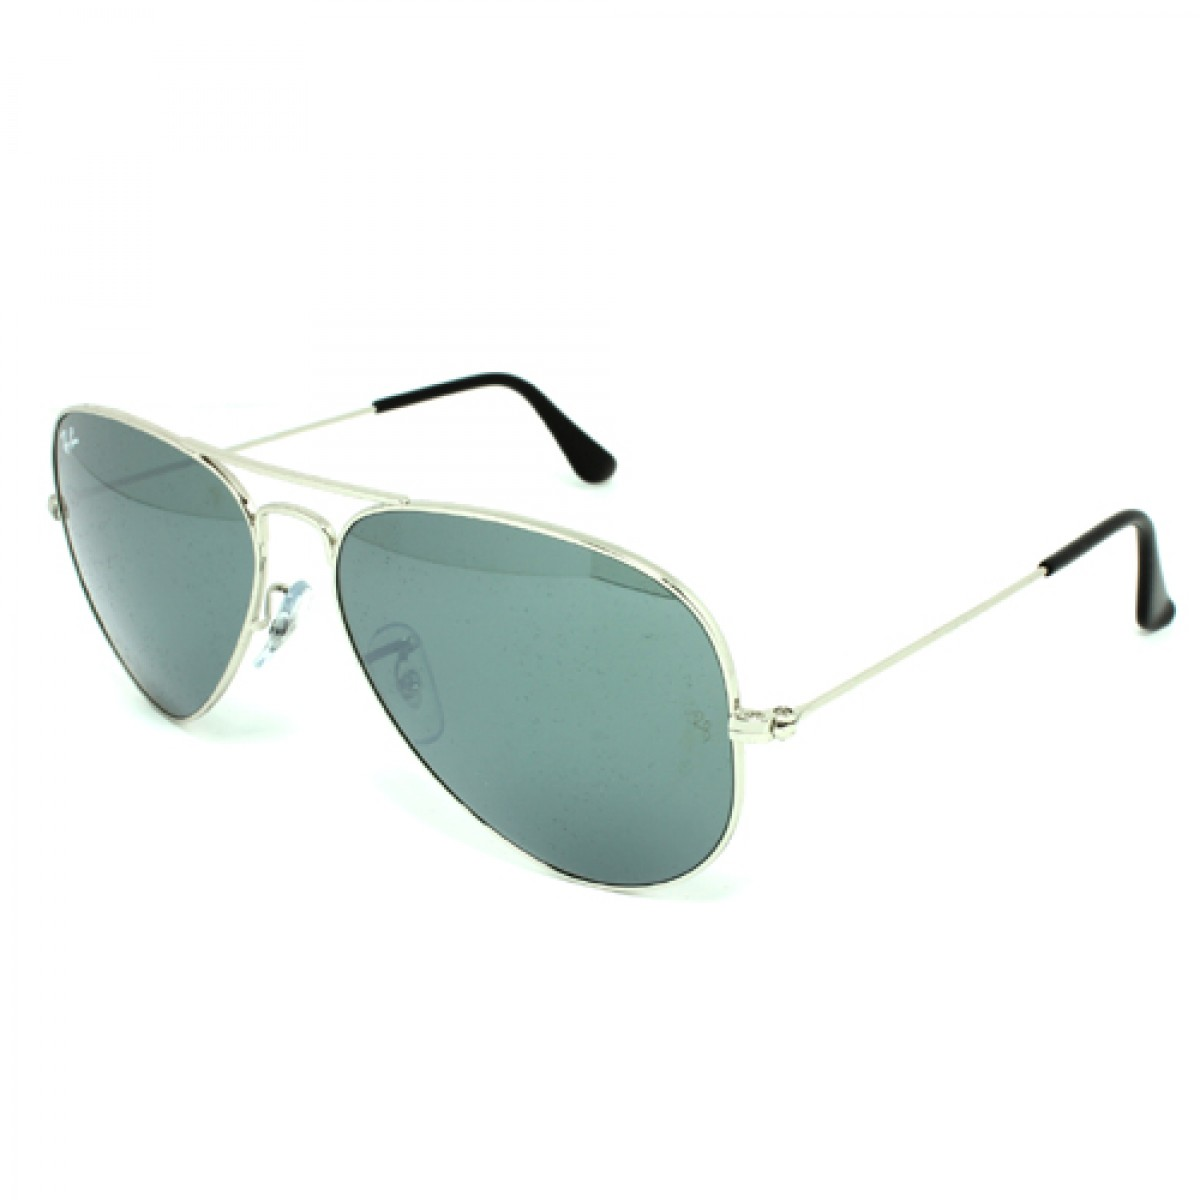 7926460bbb Ray Ban Original Aviator Unisex Sunglasses RB3025-W3275 - Sunglasses -  Fashion World